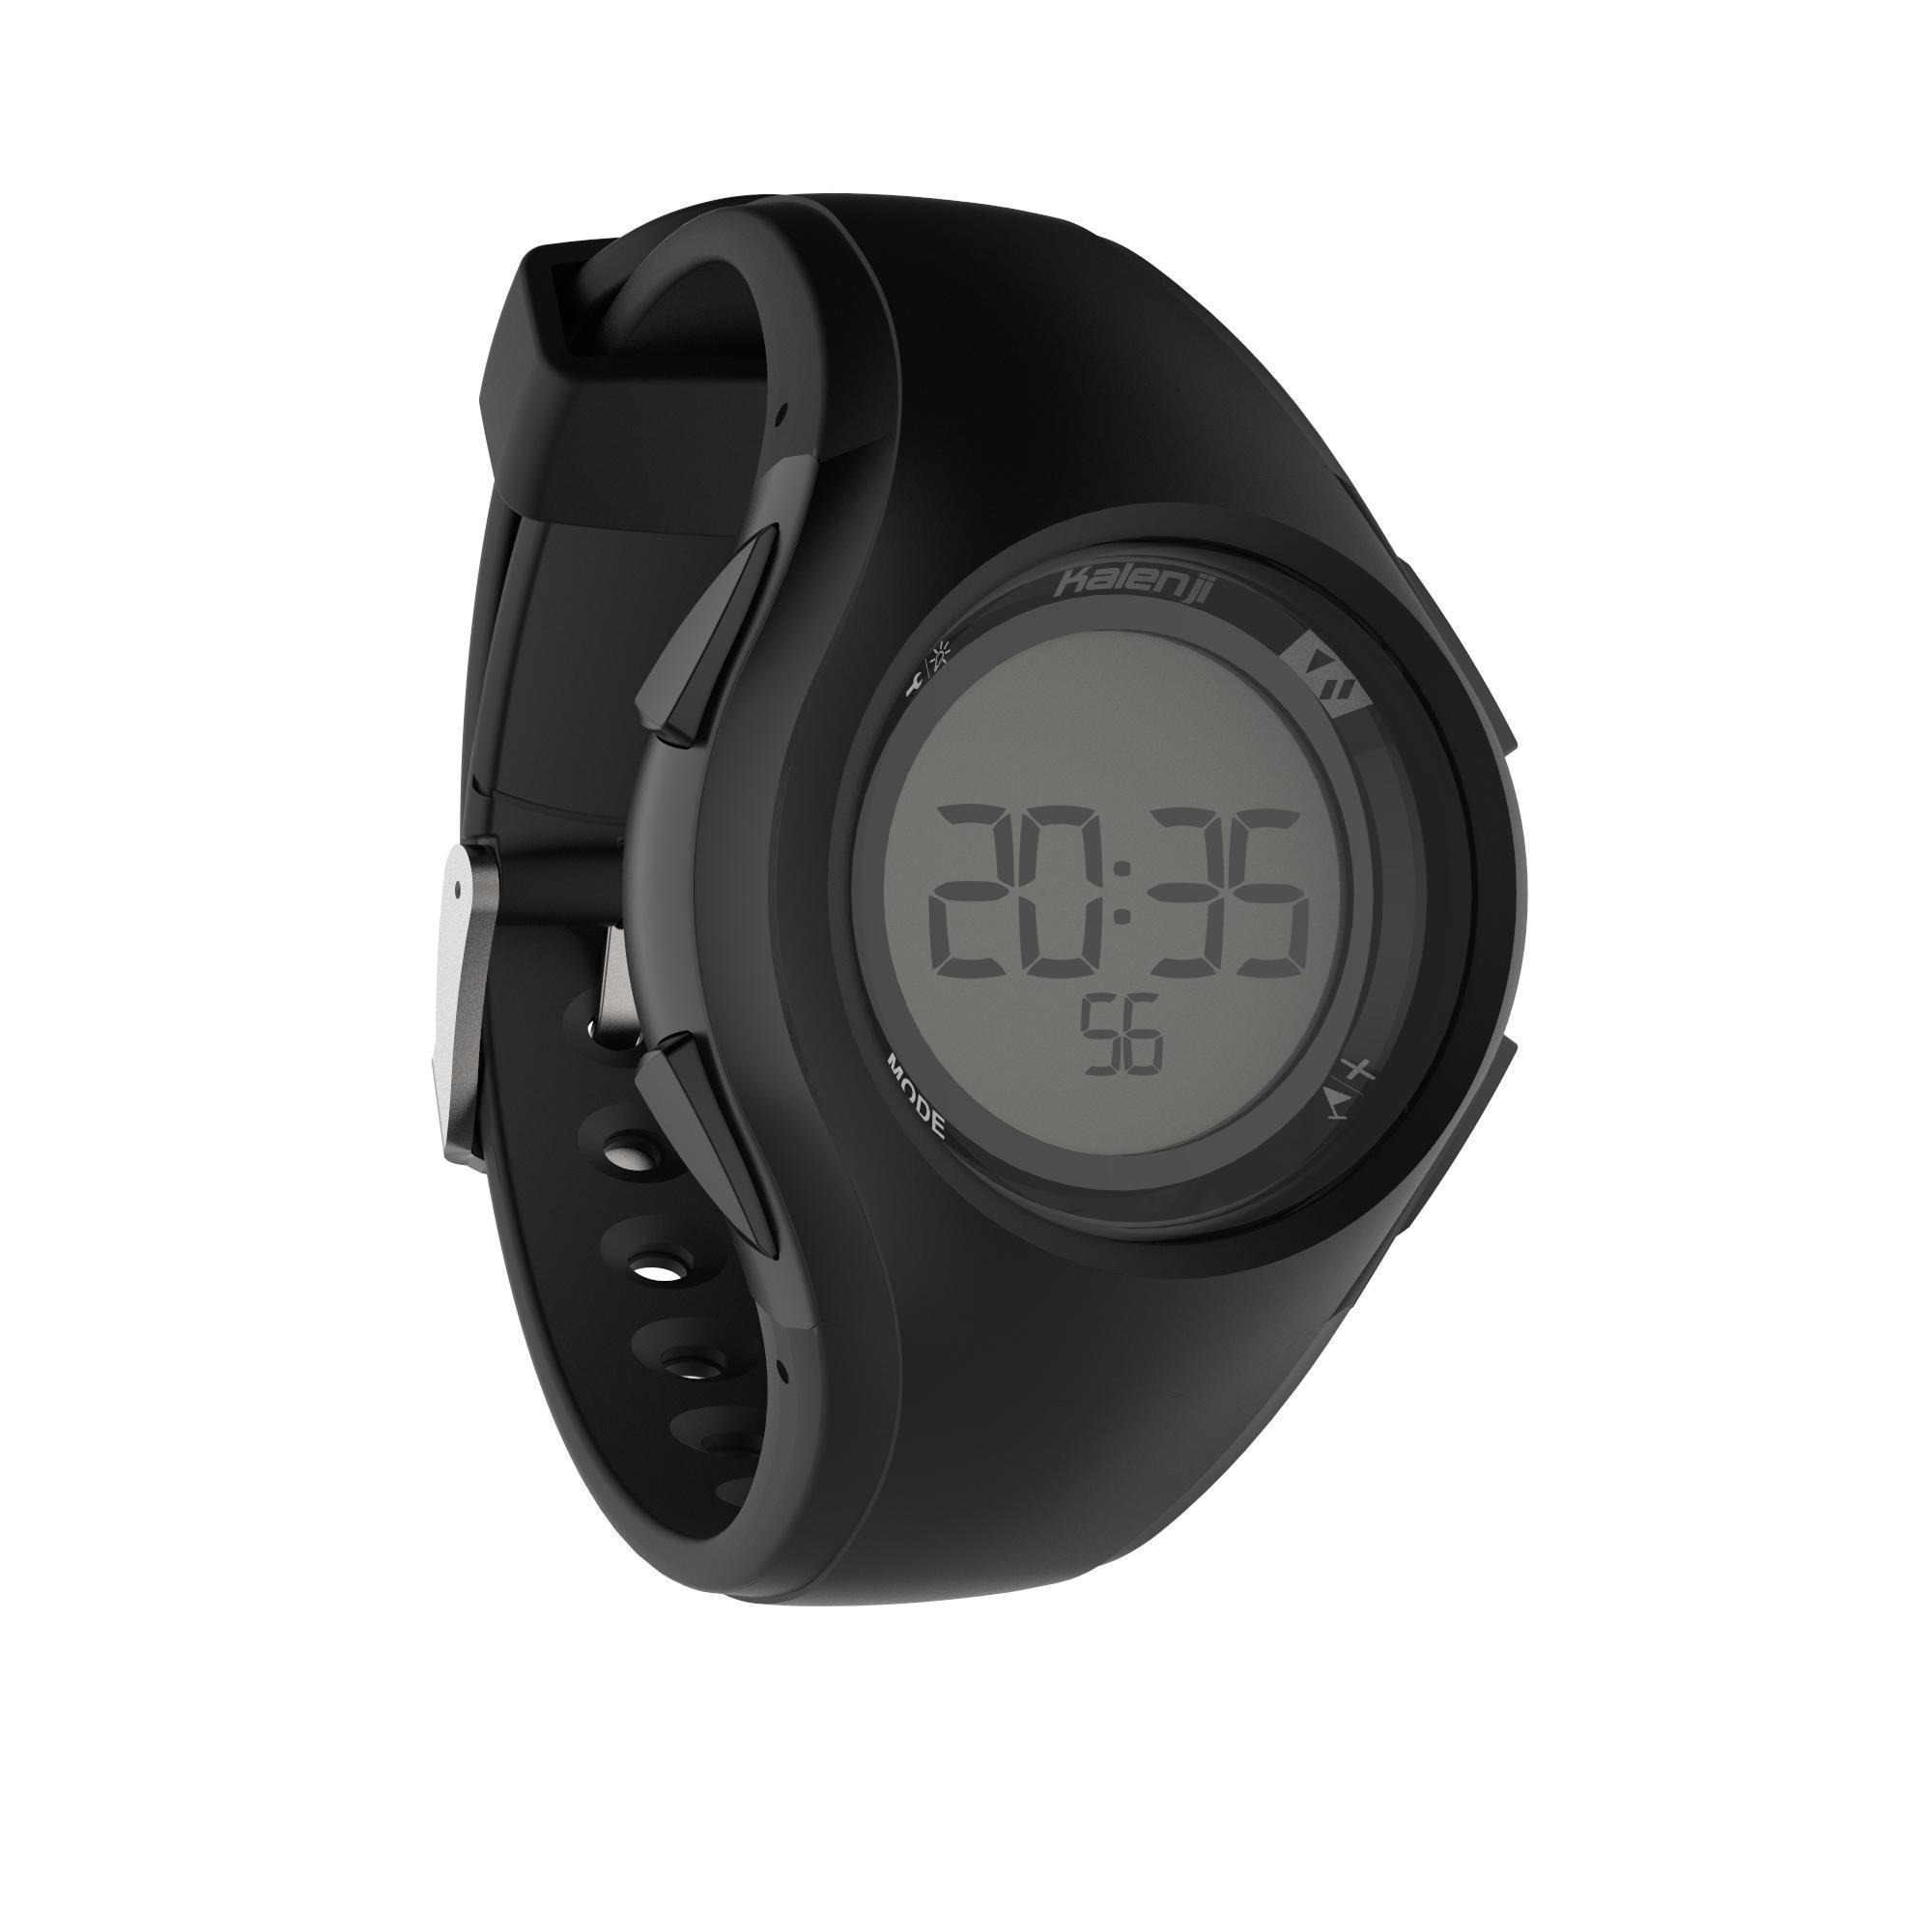 b1b440da89f Kalenji horloge stopwatch W200 M lopers | Decathlon.nl